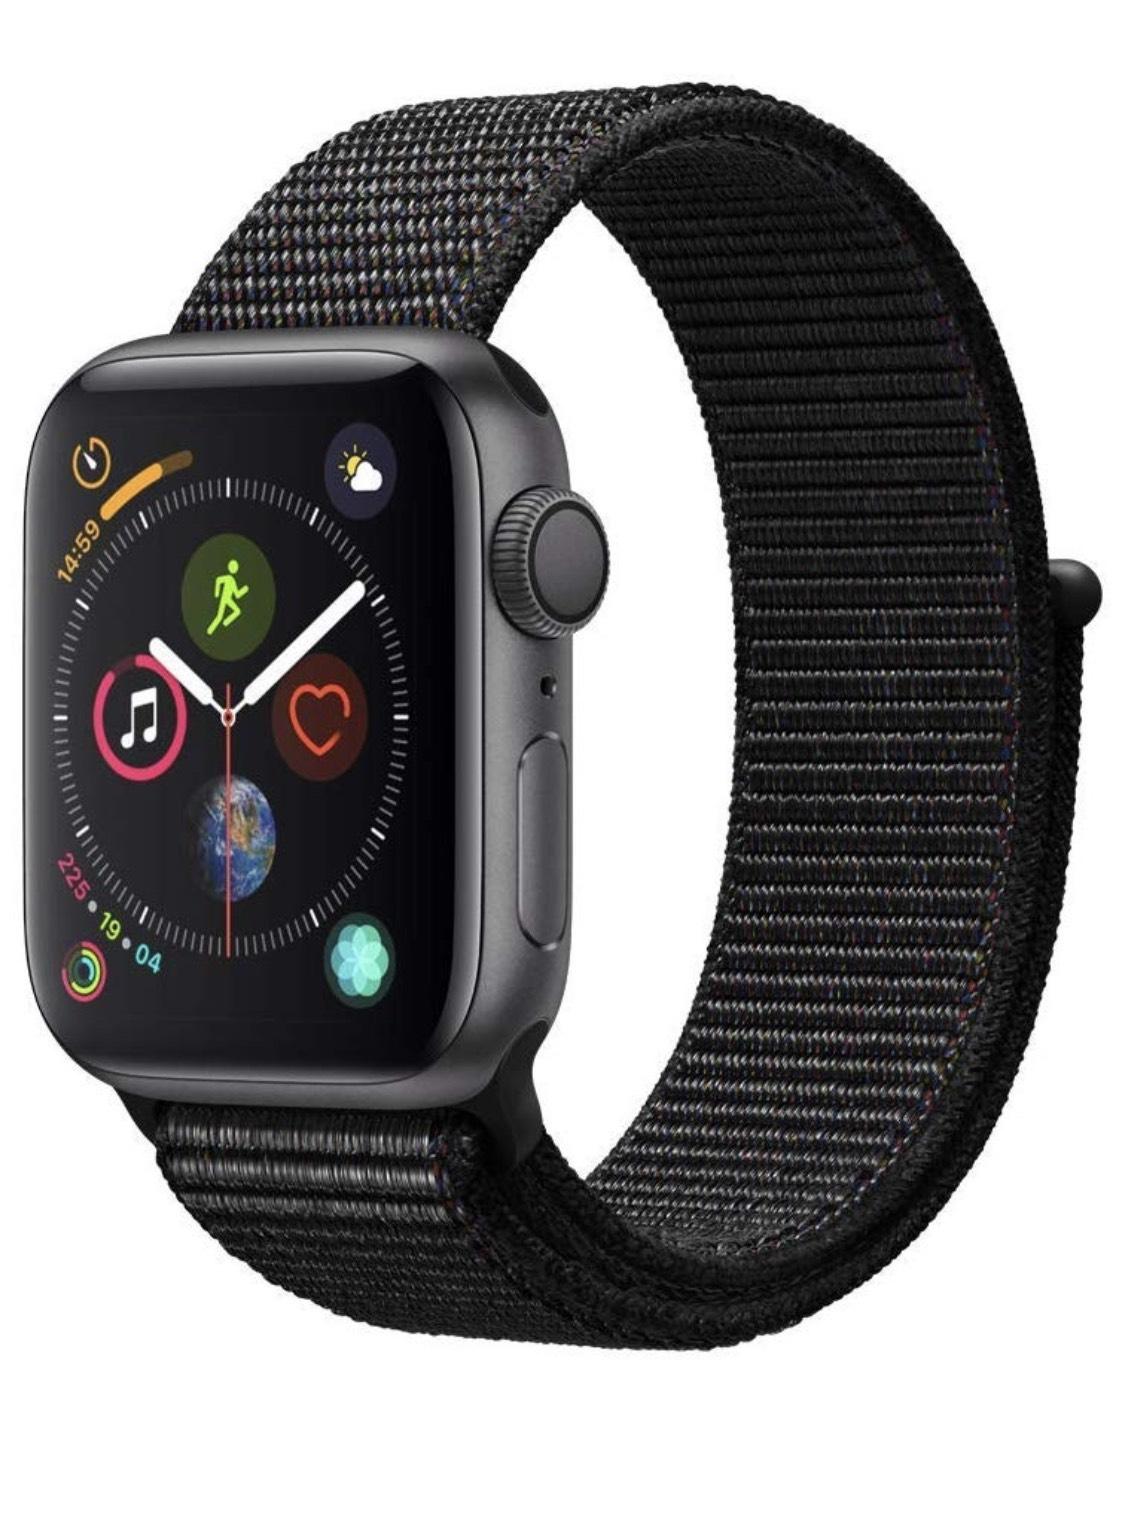 Apple Watch Series 4 (GPS) 40 mm Aluminiumgehäuse, Space Grau, mit Sport Loop, Schwarz PLUS PORTO FRANCE